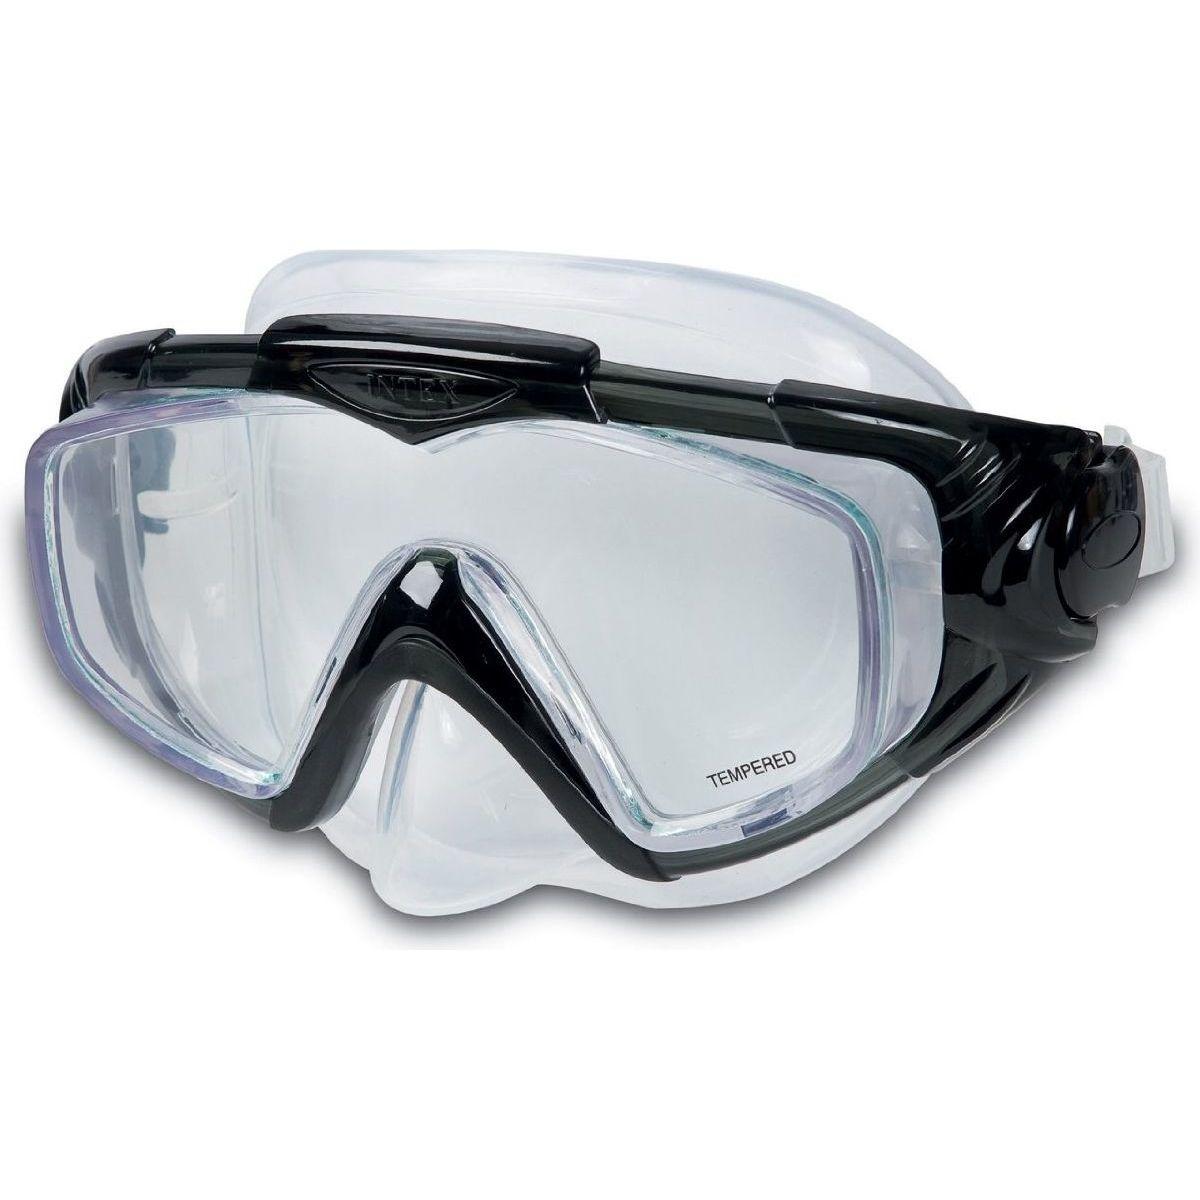 Intex 55981 Potápěčské brýle Aqua - Černá